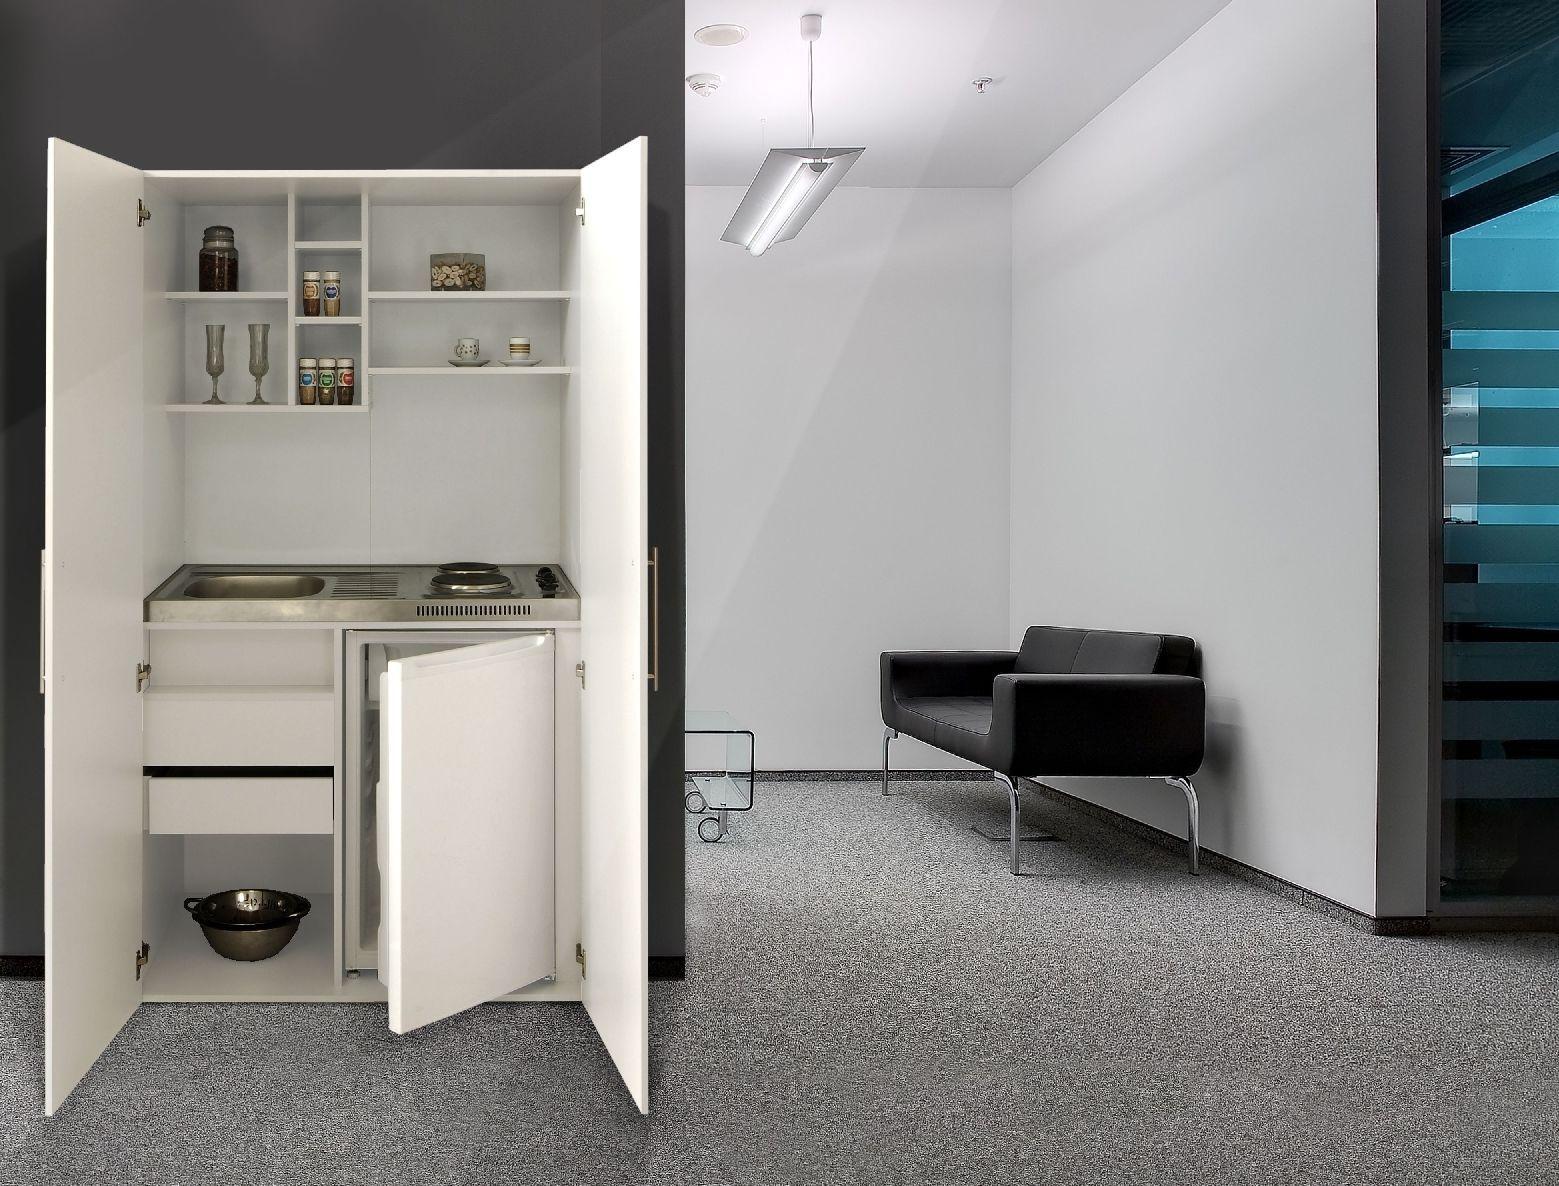 Details zu respekta Single Büroküche Pantry Küche Miniküche ...